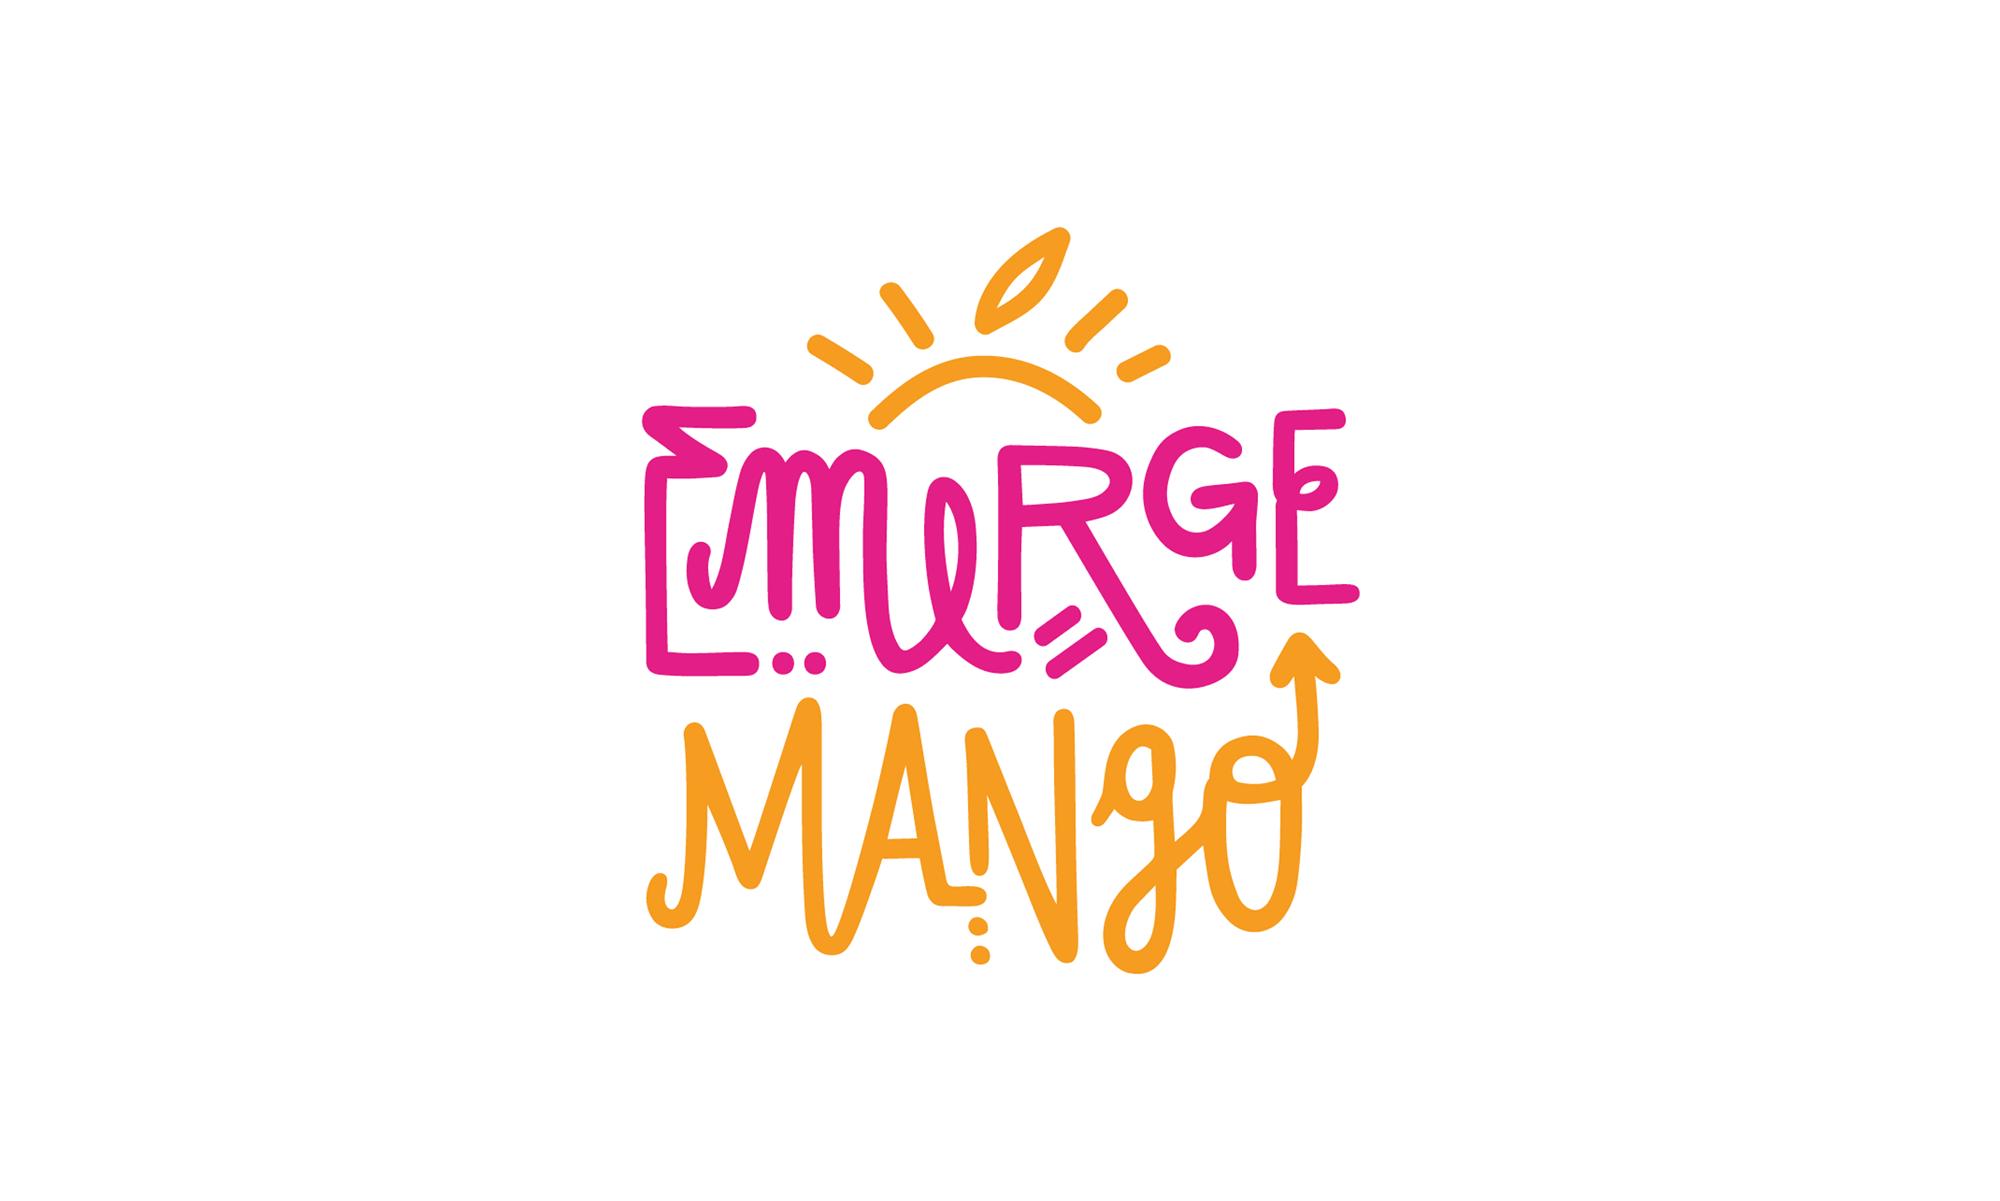 EmergeMangoBrandIdentity_single-01.png